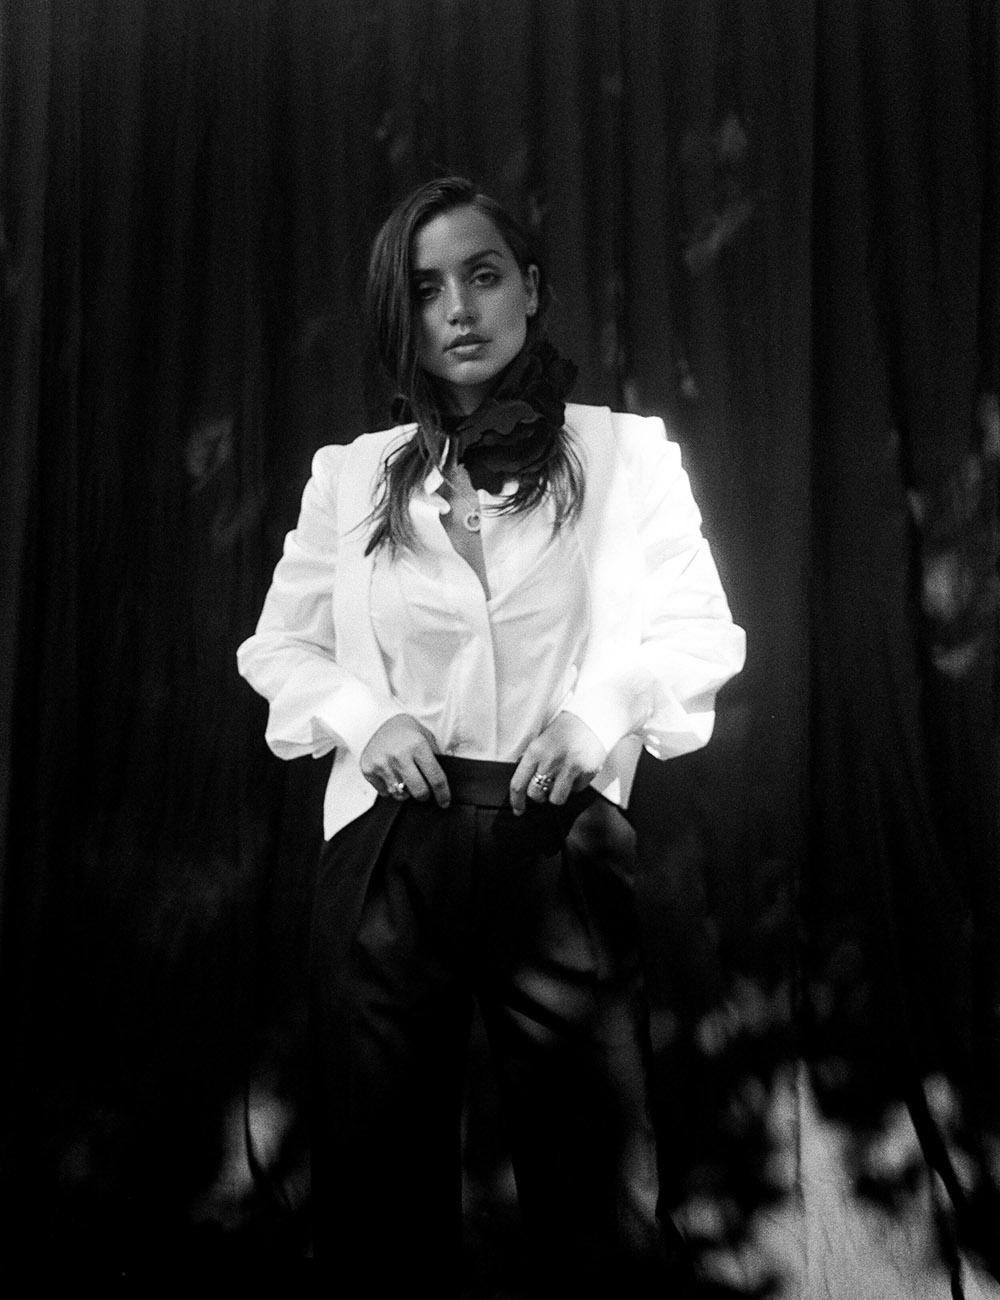 Ana de Armas covers Flaunt Magazine Issue 172 by Yana Yatsuk